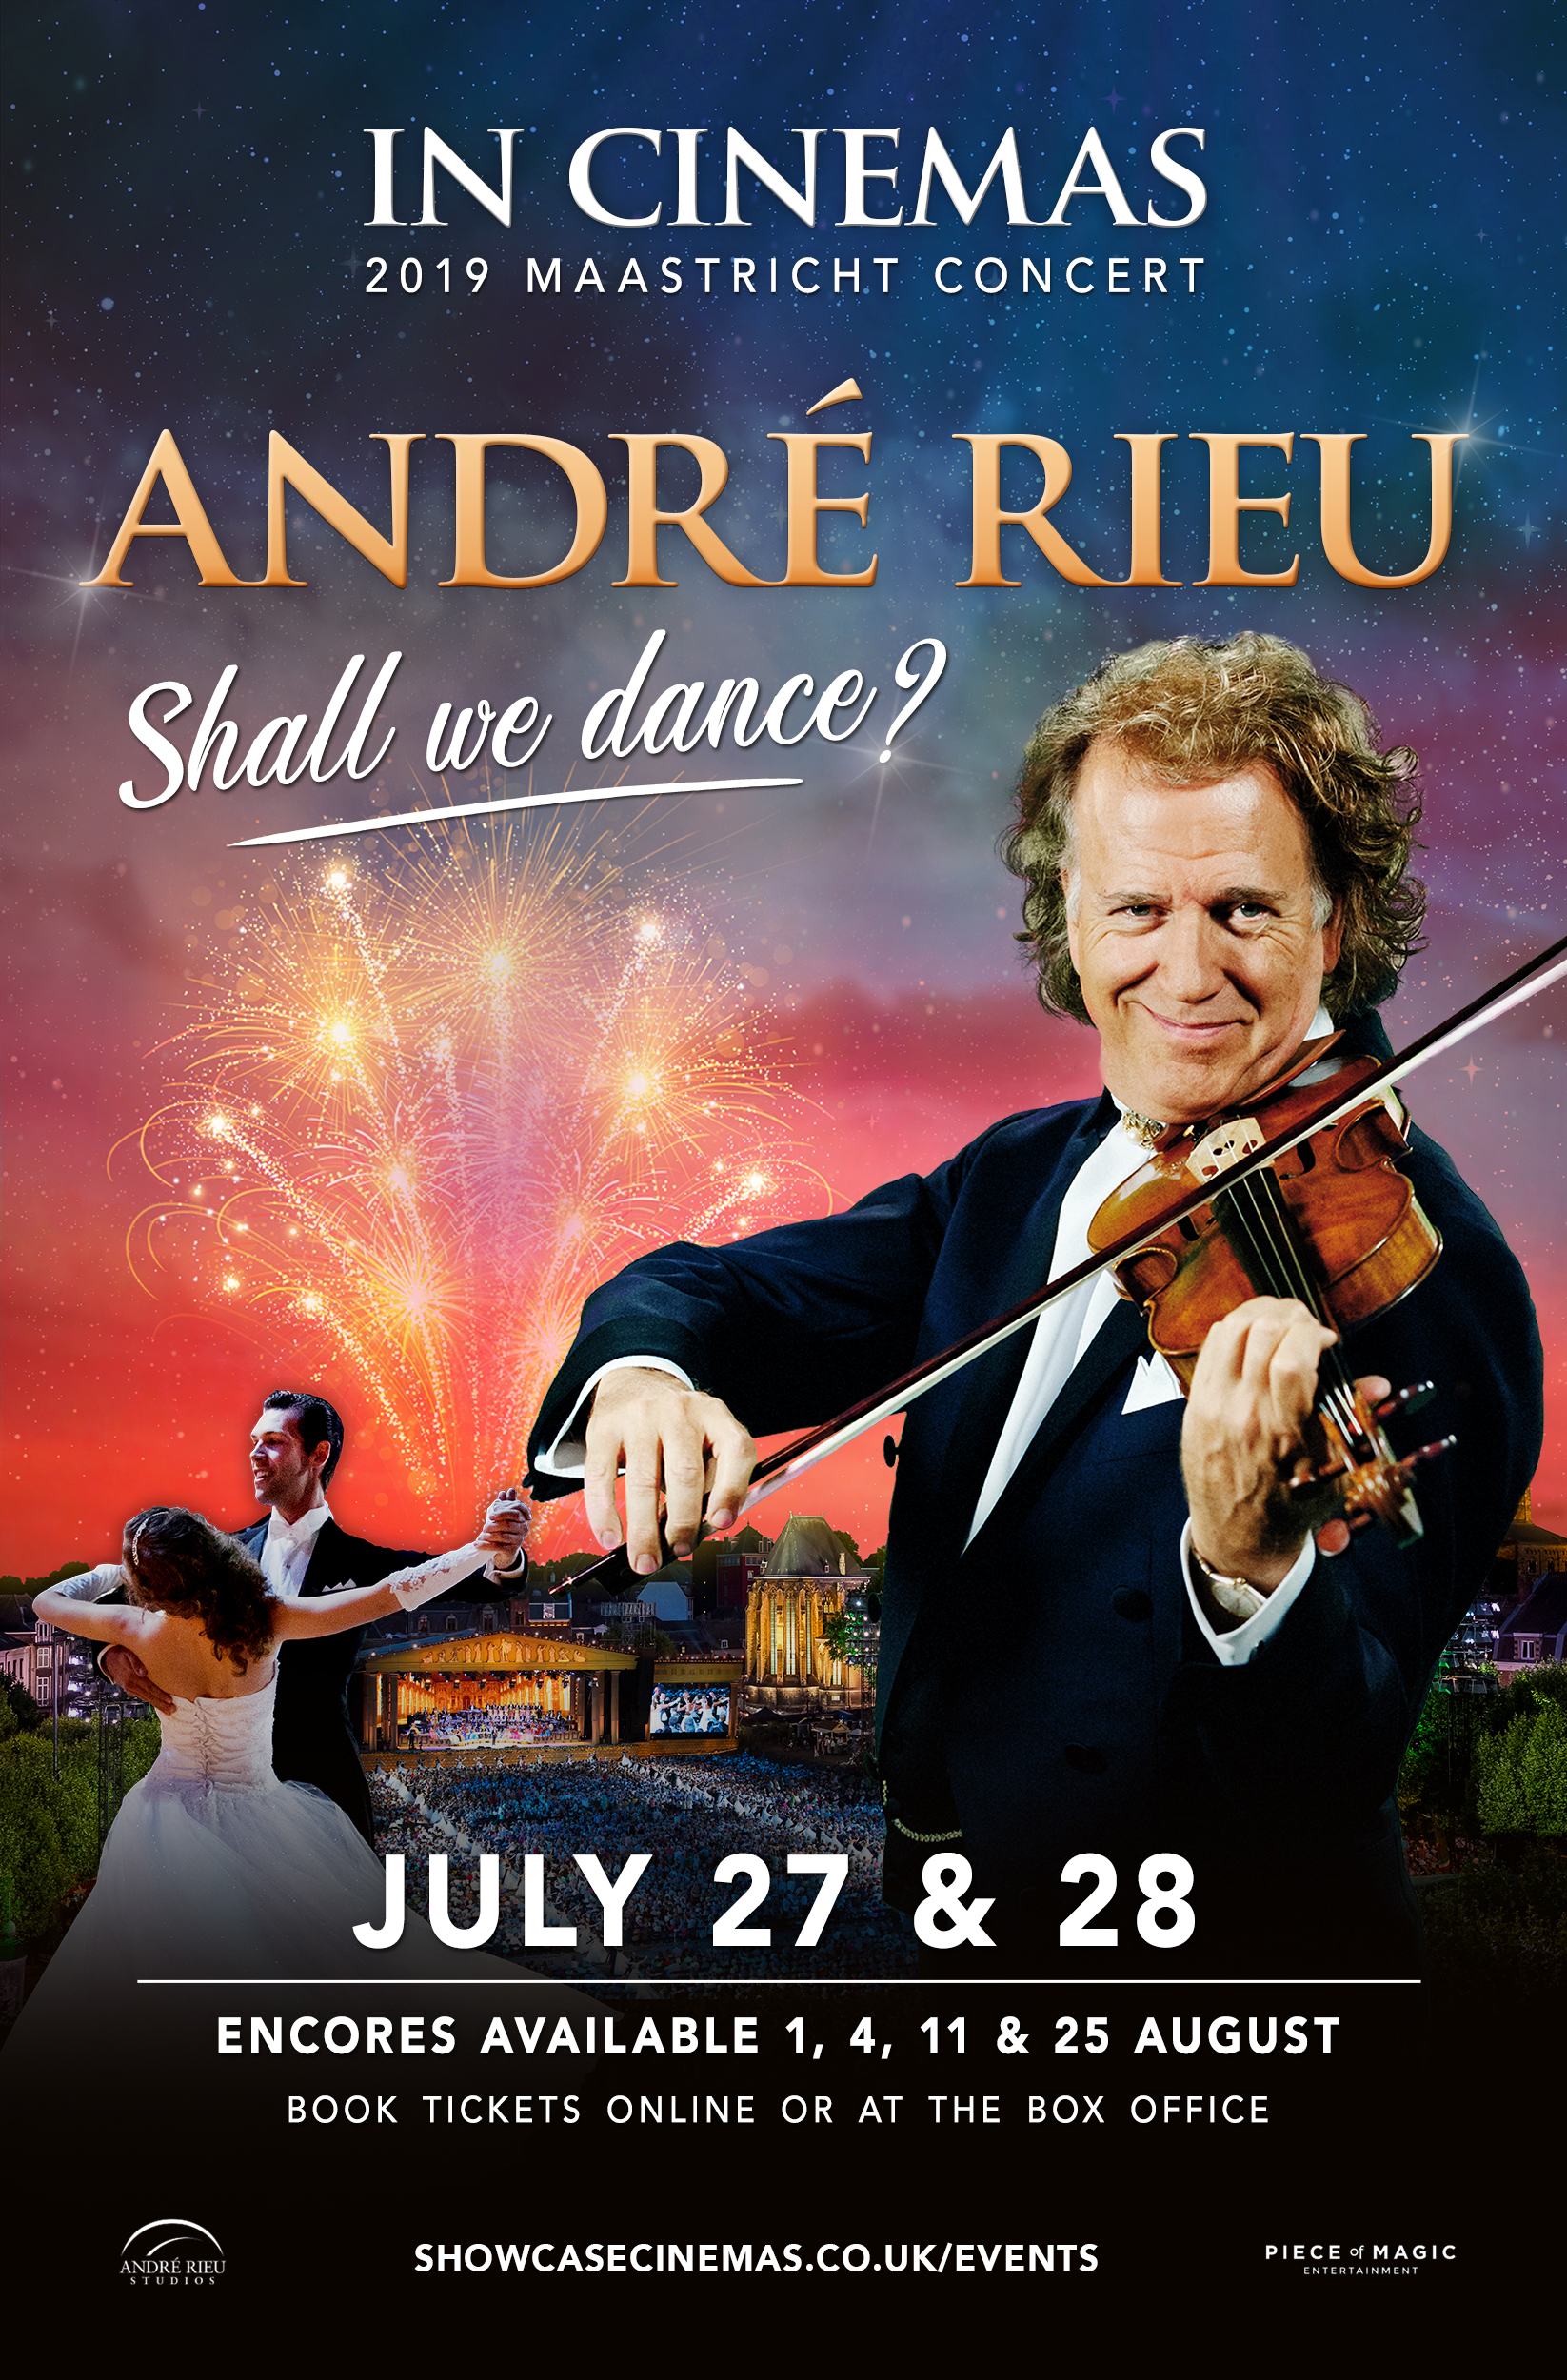 André Rieu Maastricht 2019: Shall We Dance? Poster